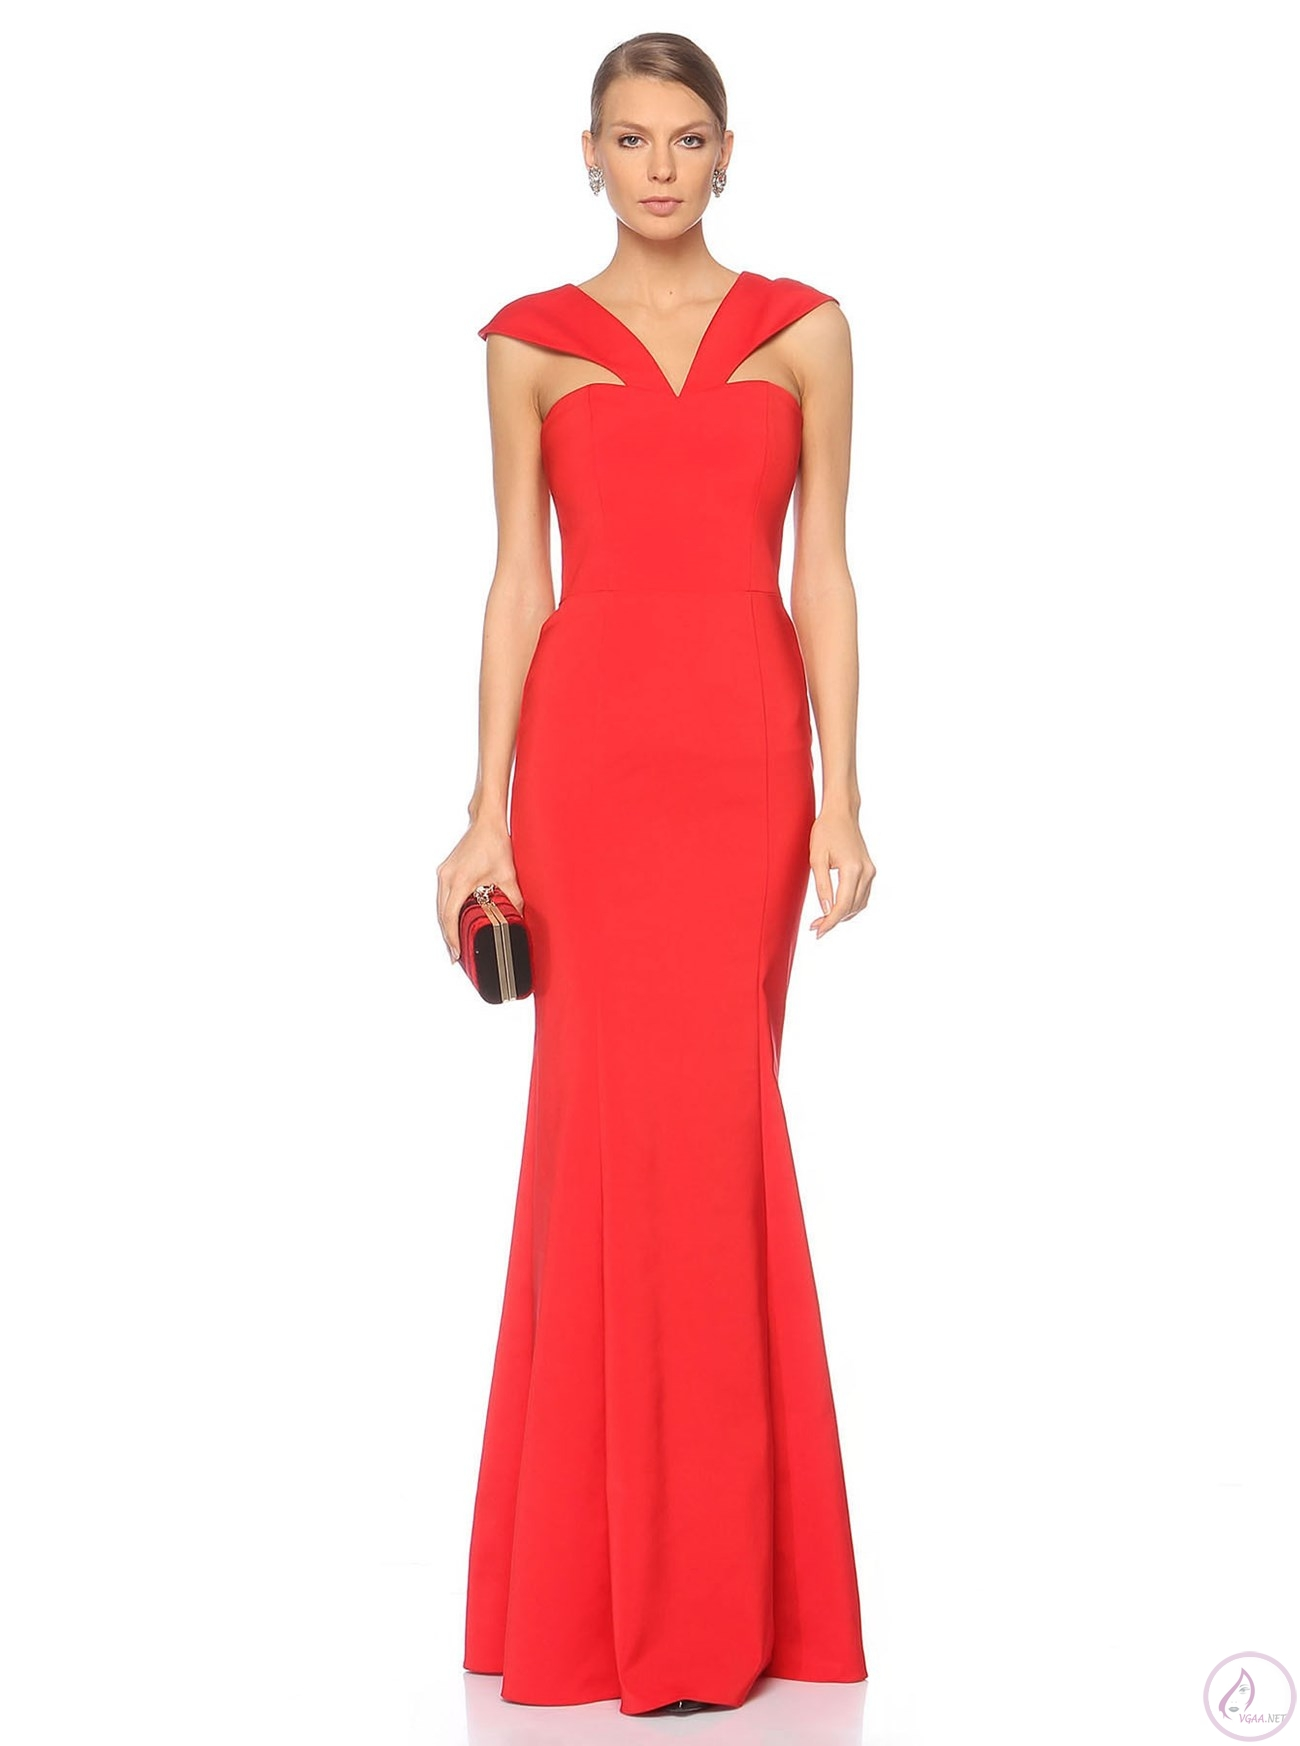 c83e5785f19e5 2014 Roman Abiye Elbise Modelleri Koleksiyonu | Vgaa.Net